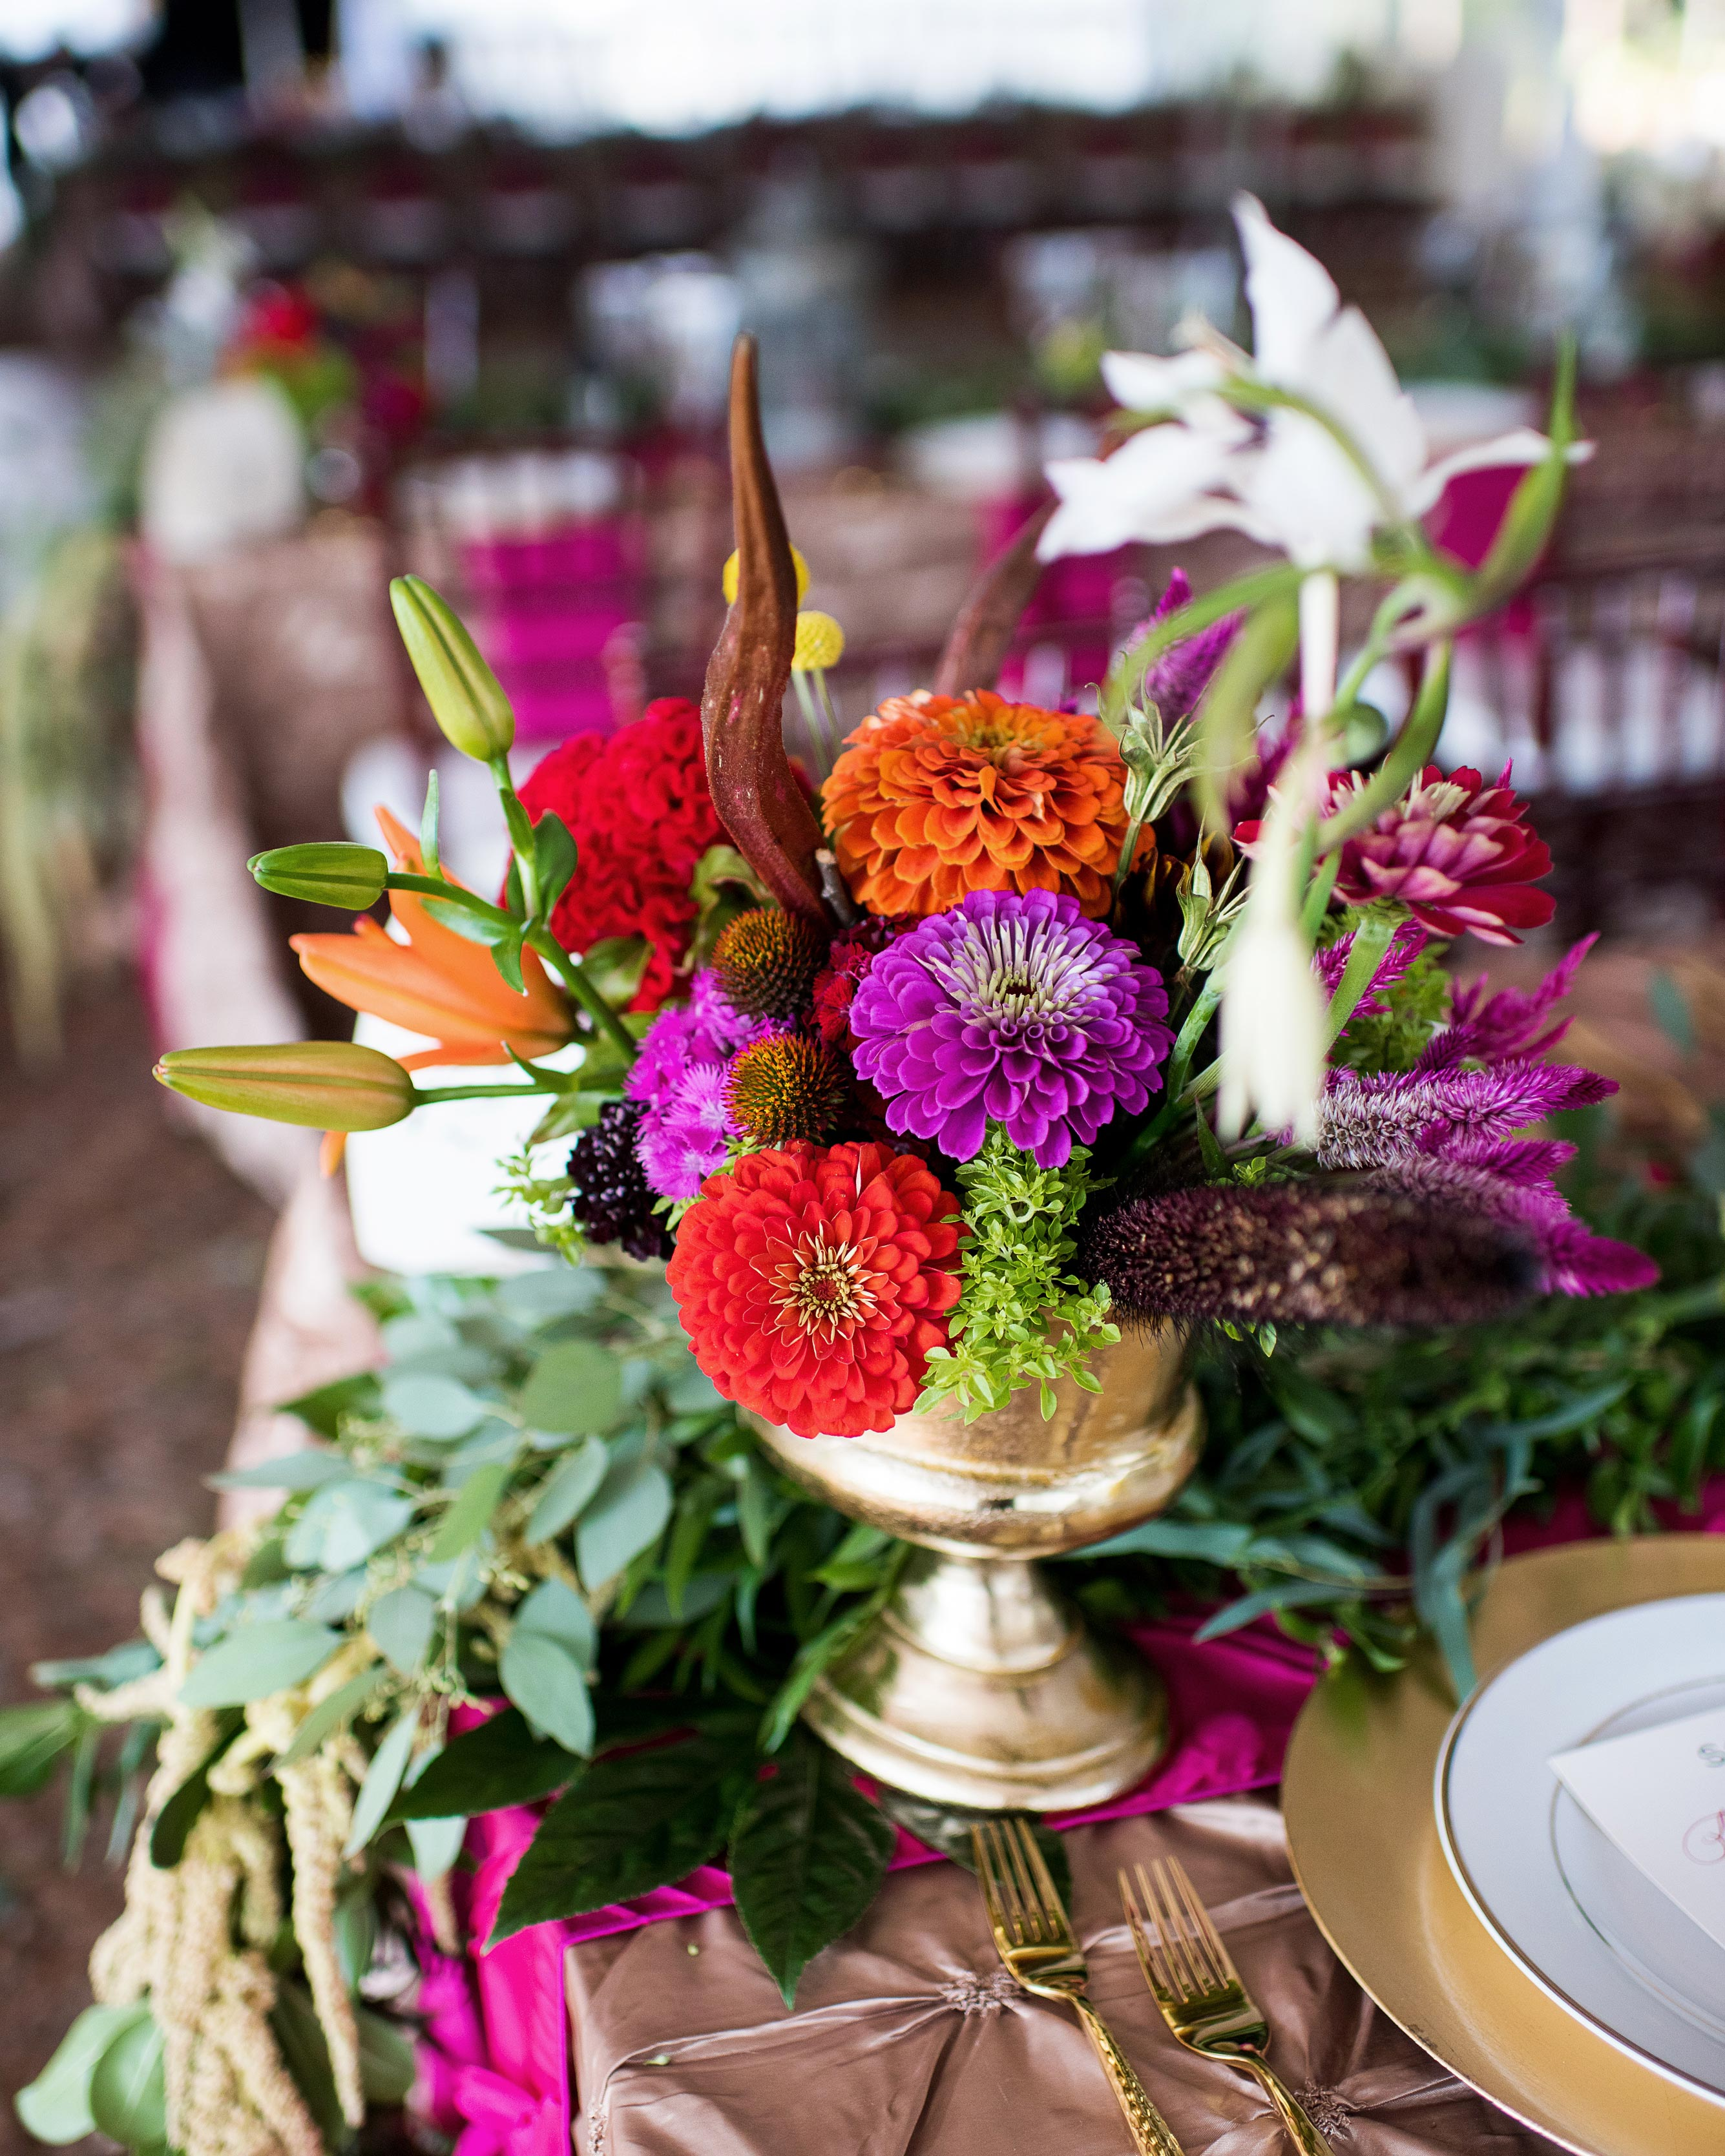 christopher-stephen-wedding-centerpiece-0467-s112787-0416.jpg